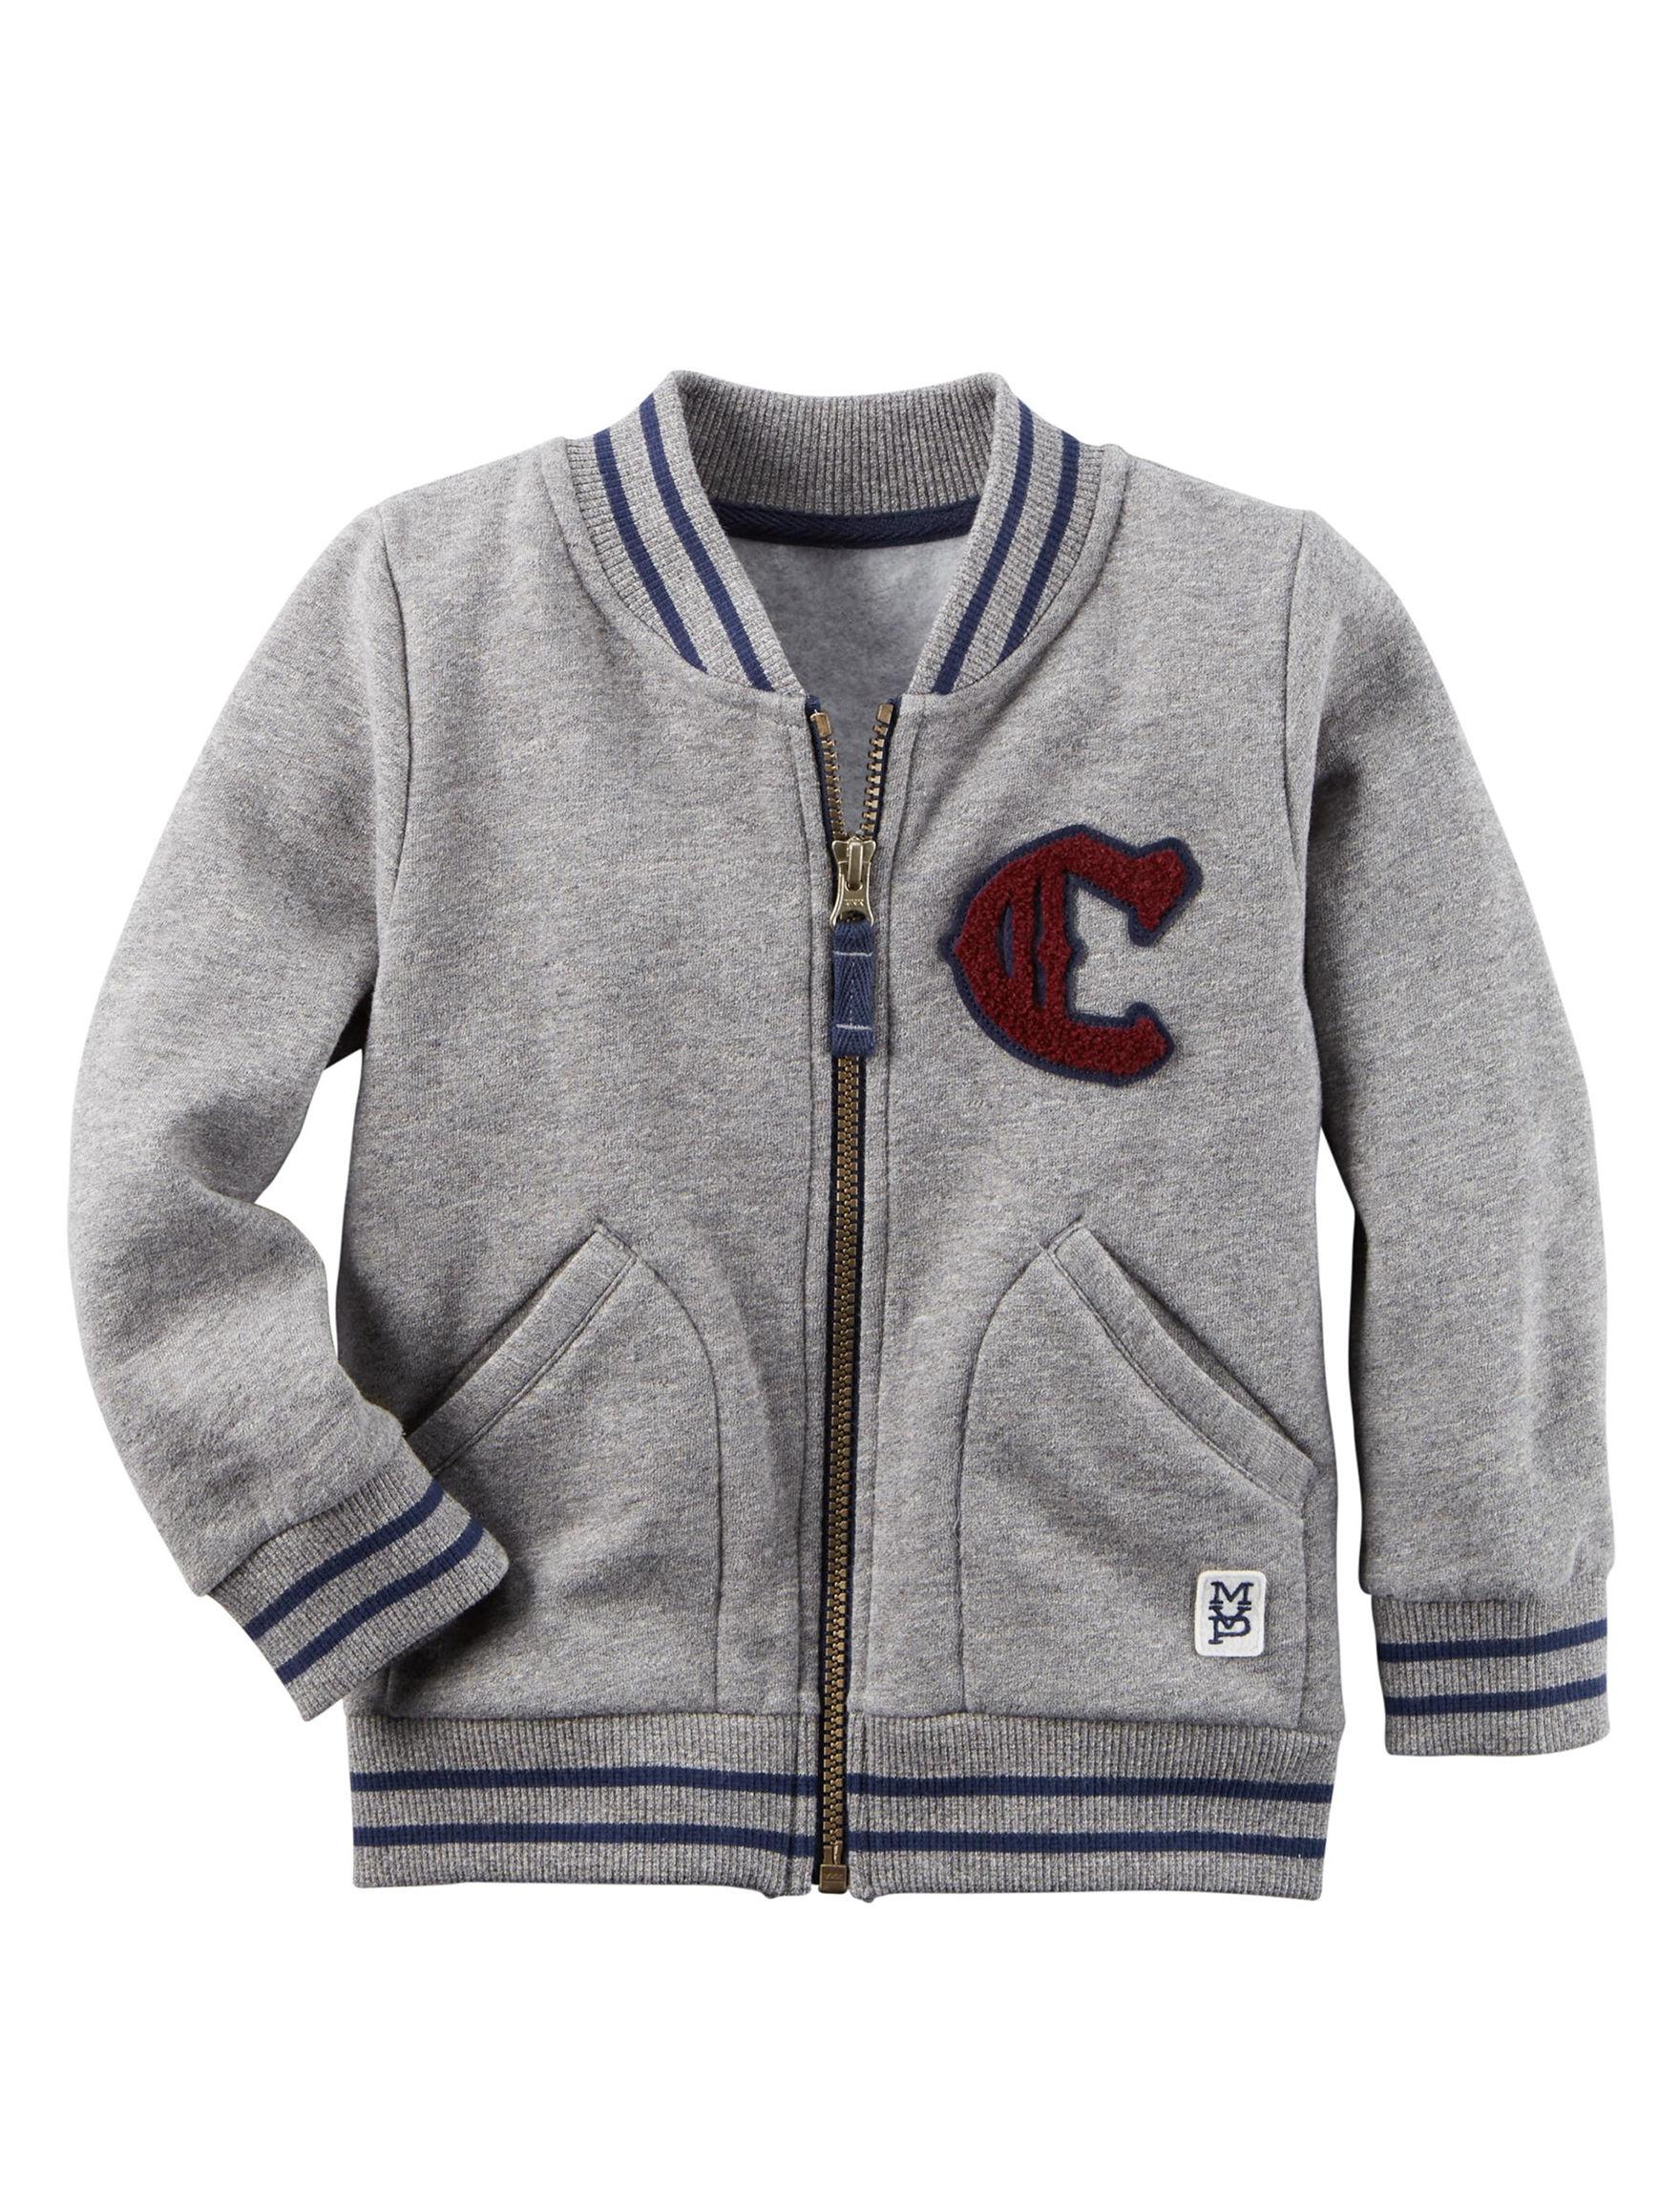 Carter's Heather Grey Lightweight Jackets & Blazers